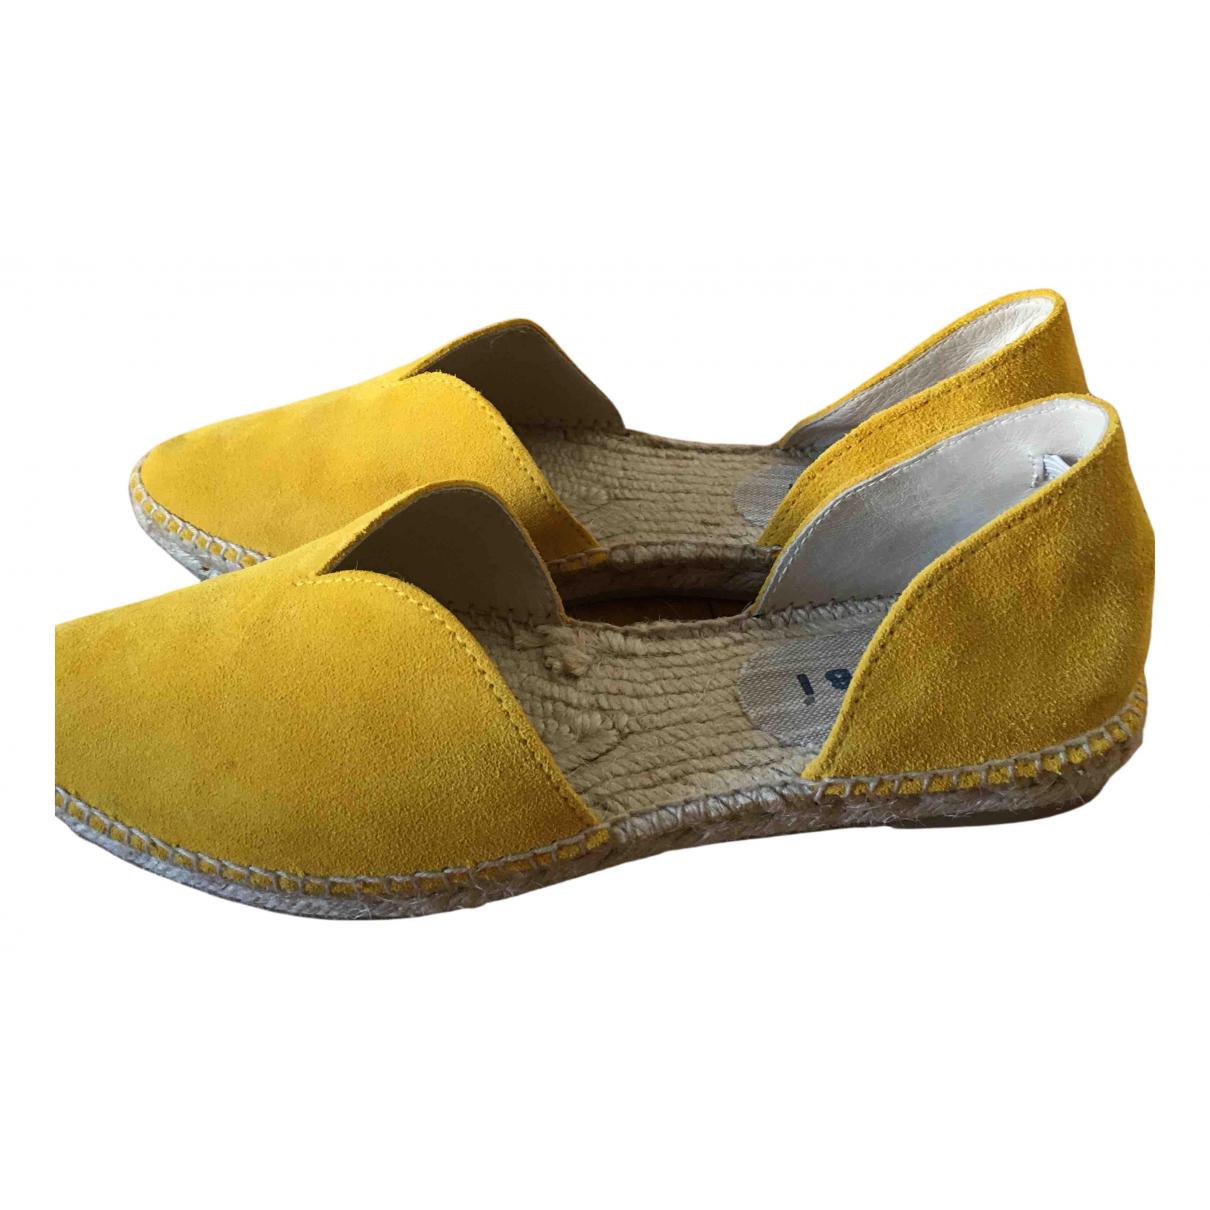 Manebi \N Espadrilles in  Gelb Veloursleder